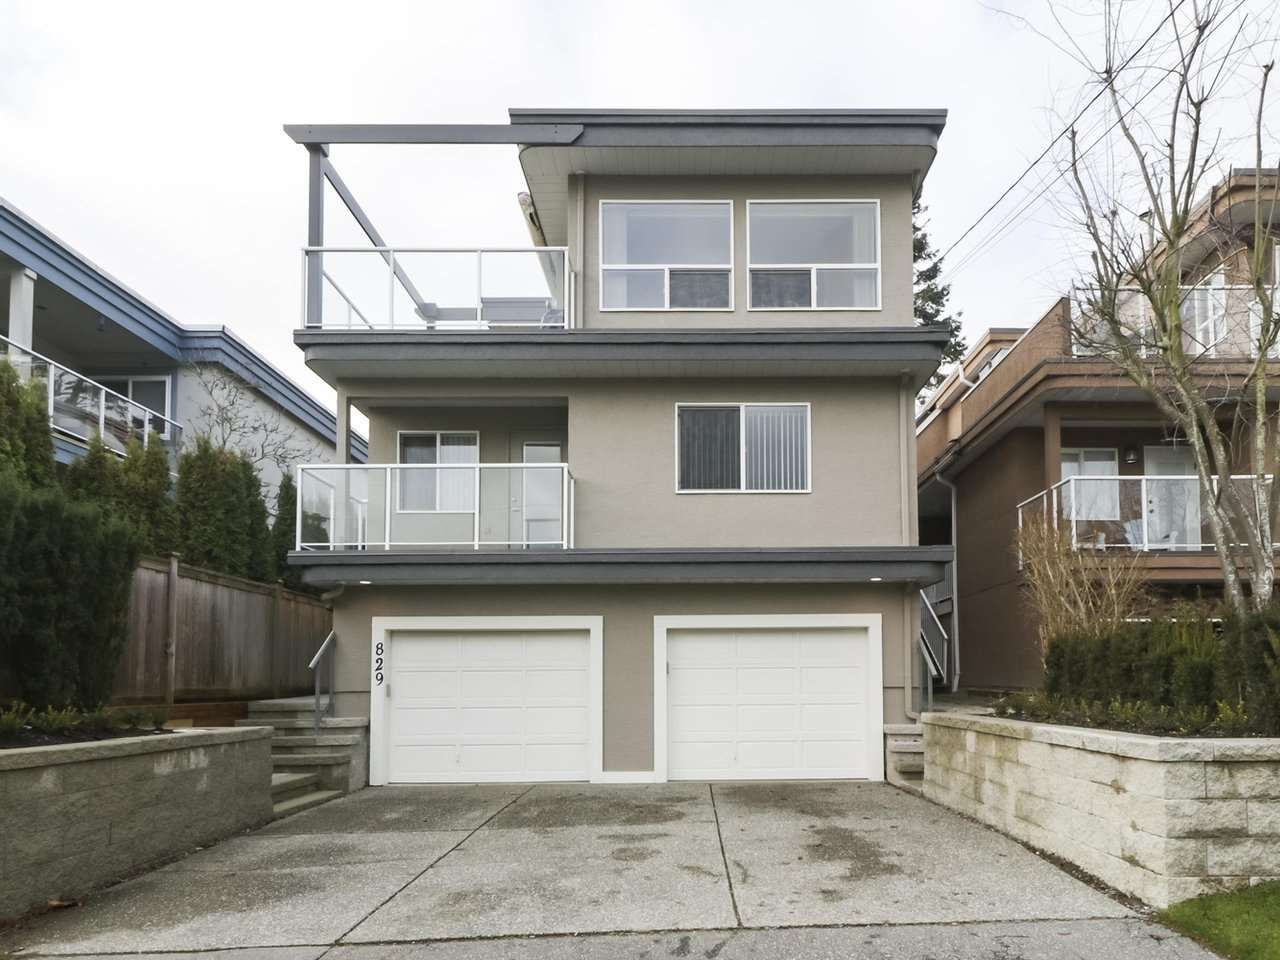 Main Photo: 829 STEVENS Street: White Rock House for sale (South Surrey White Rock)  : MLS®# R2421211